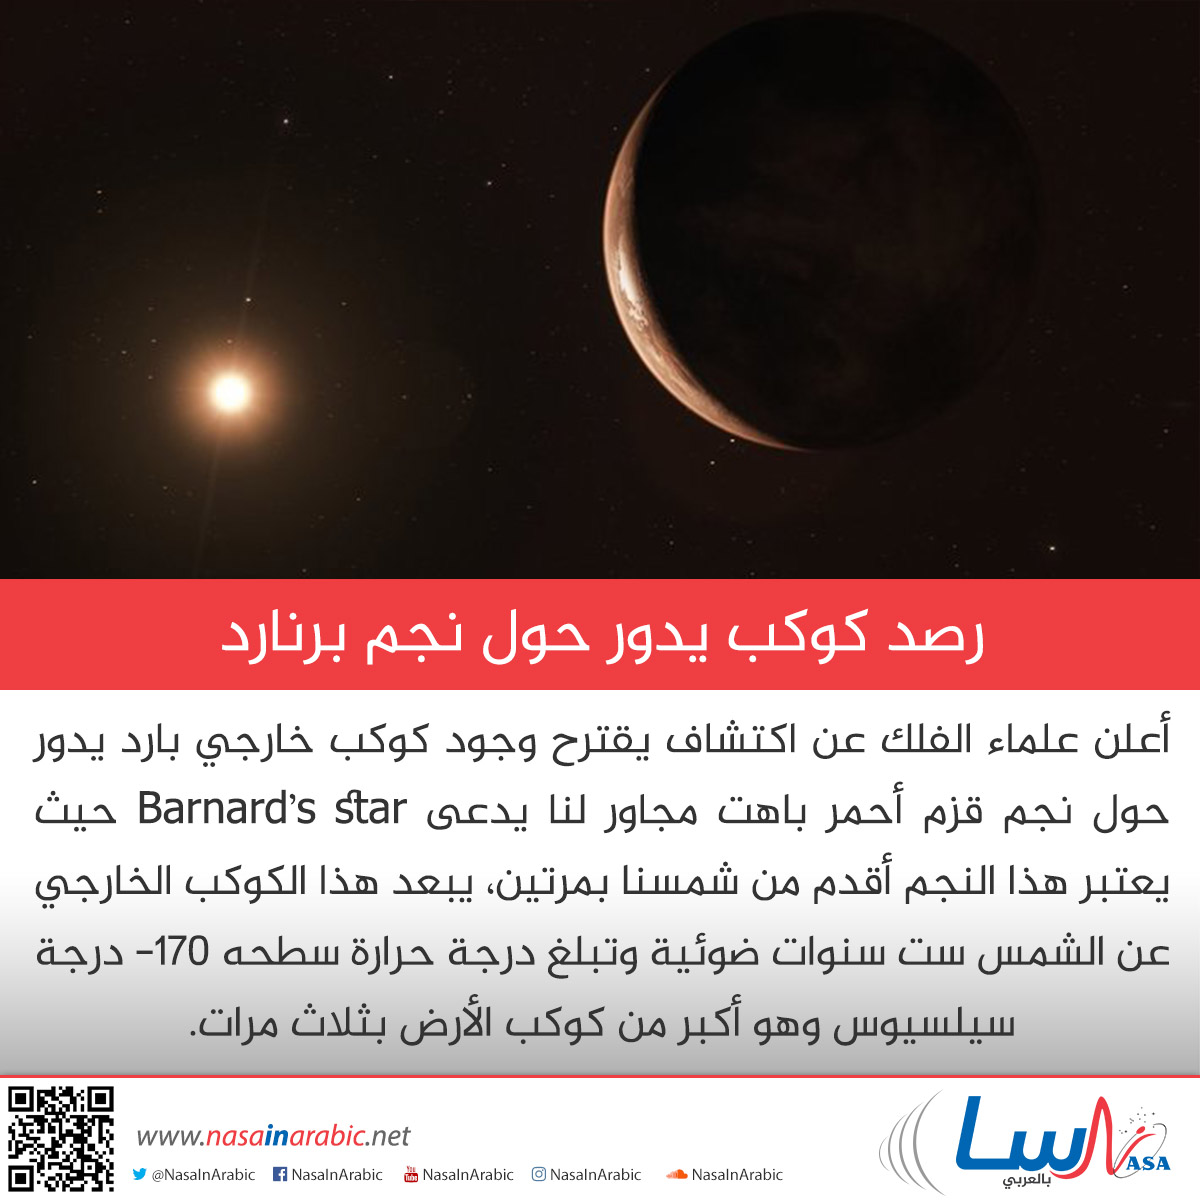 رصد كوكبٍ يدور حول نجم برنارد